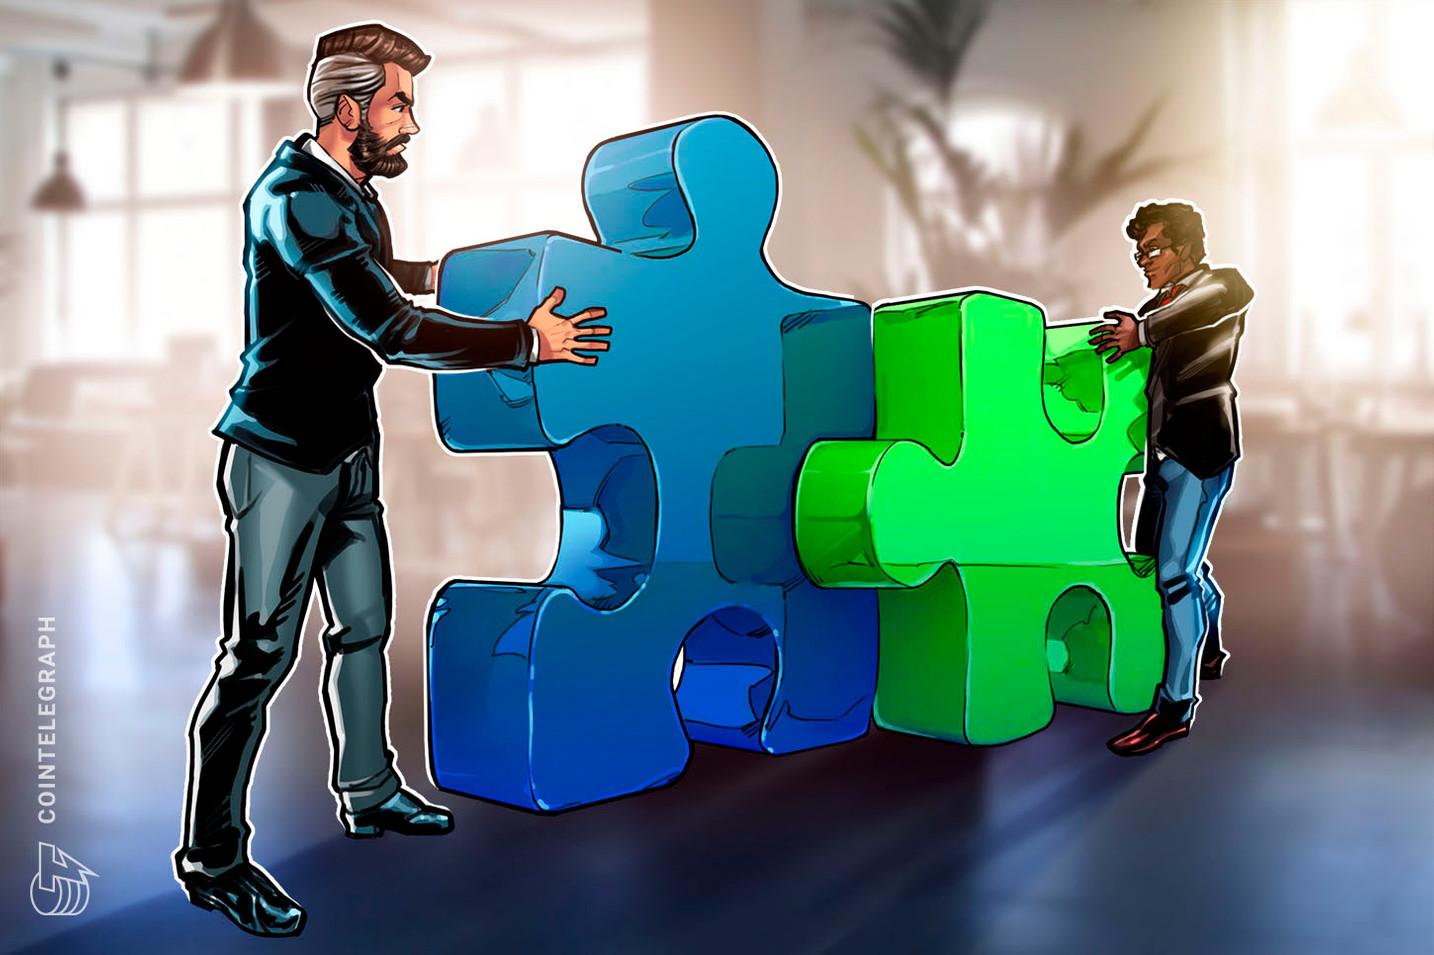 Gigante financeira SBI Holdings anuncia joint venture com empresa de blockchain